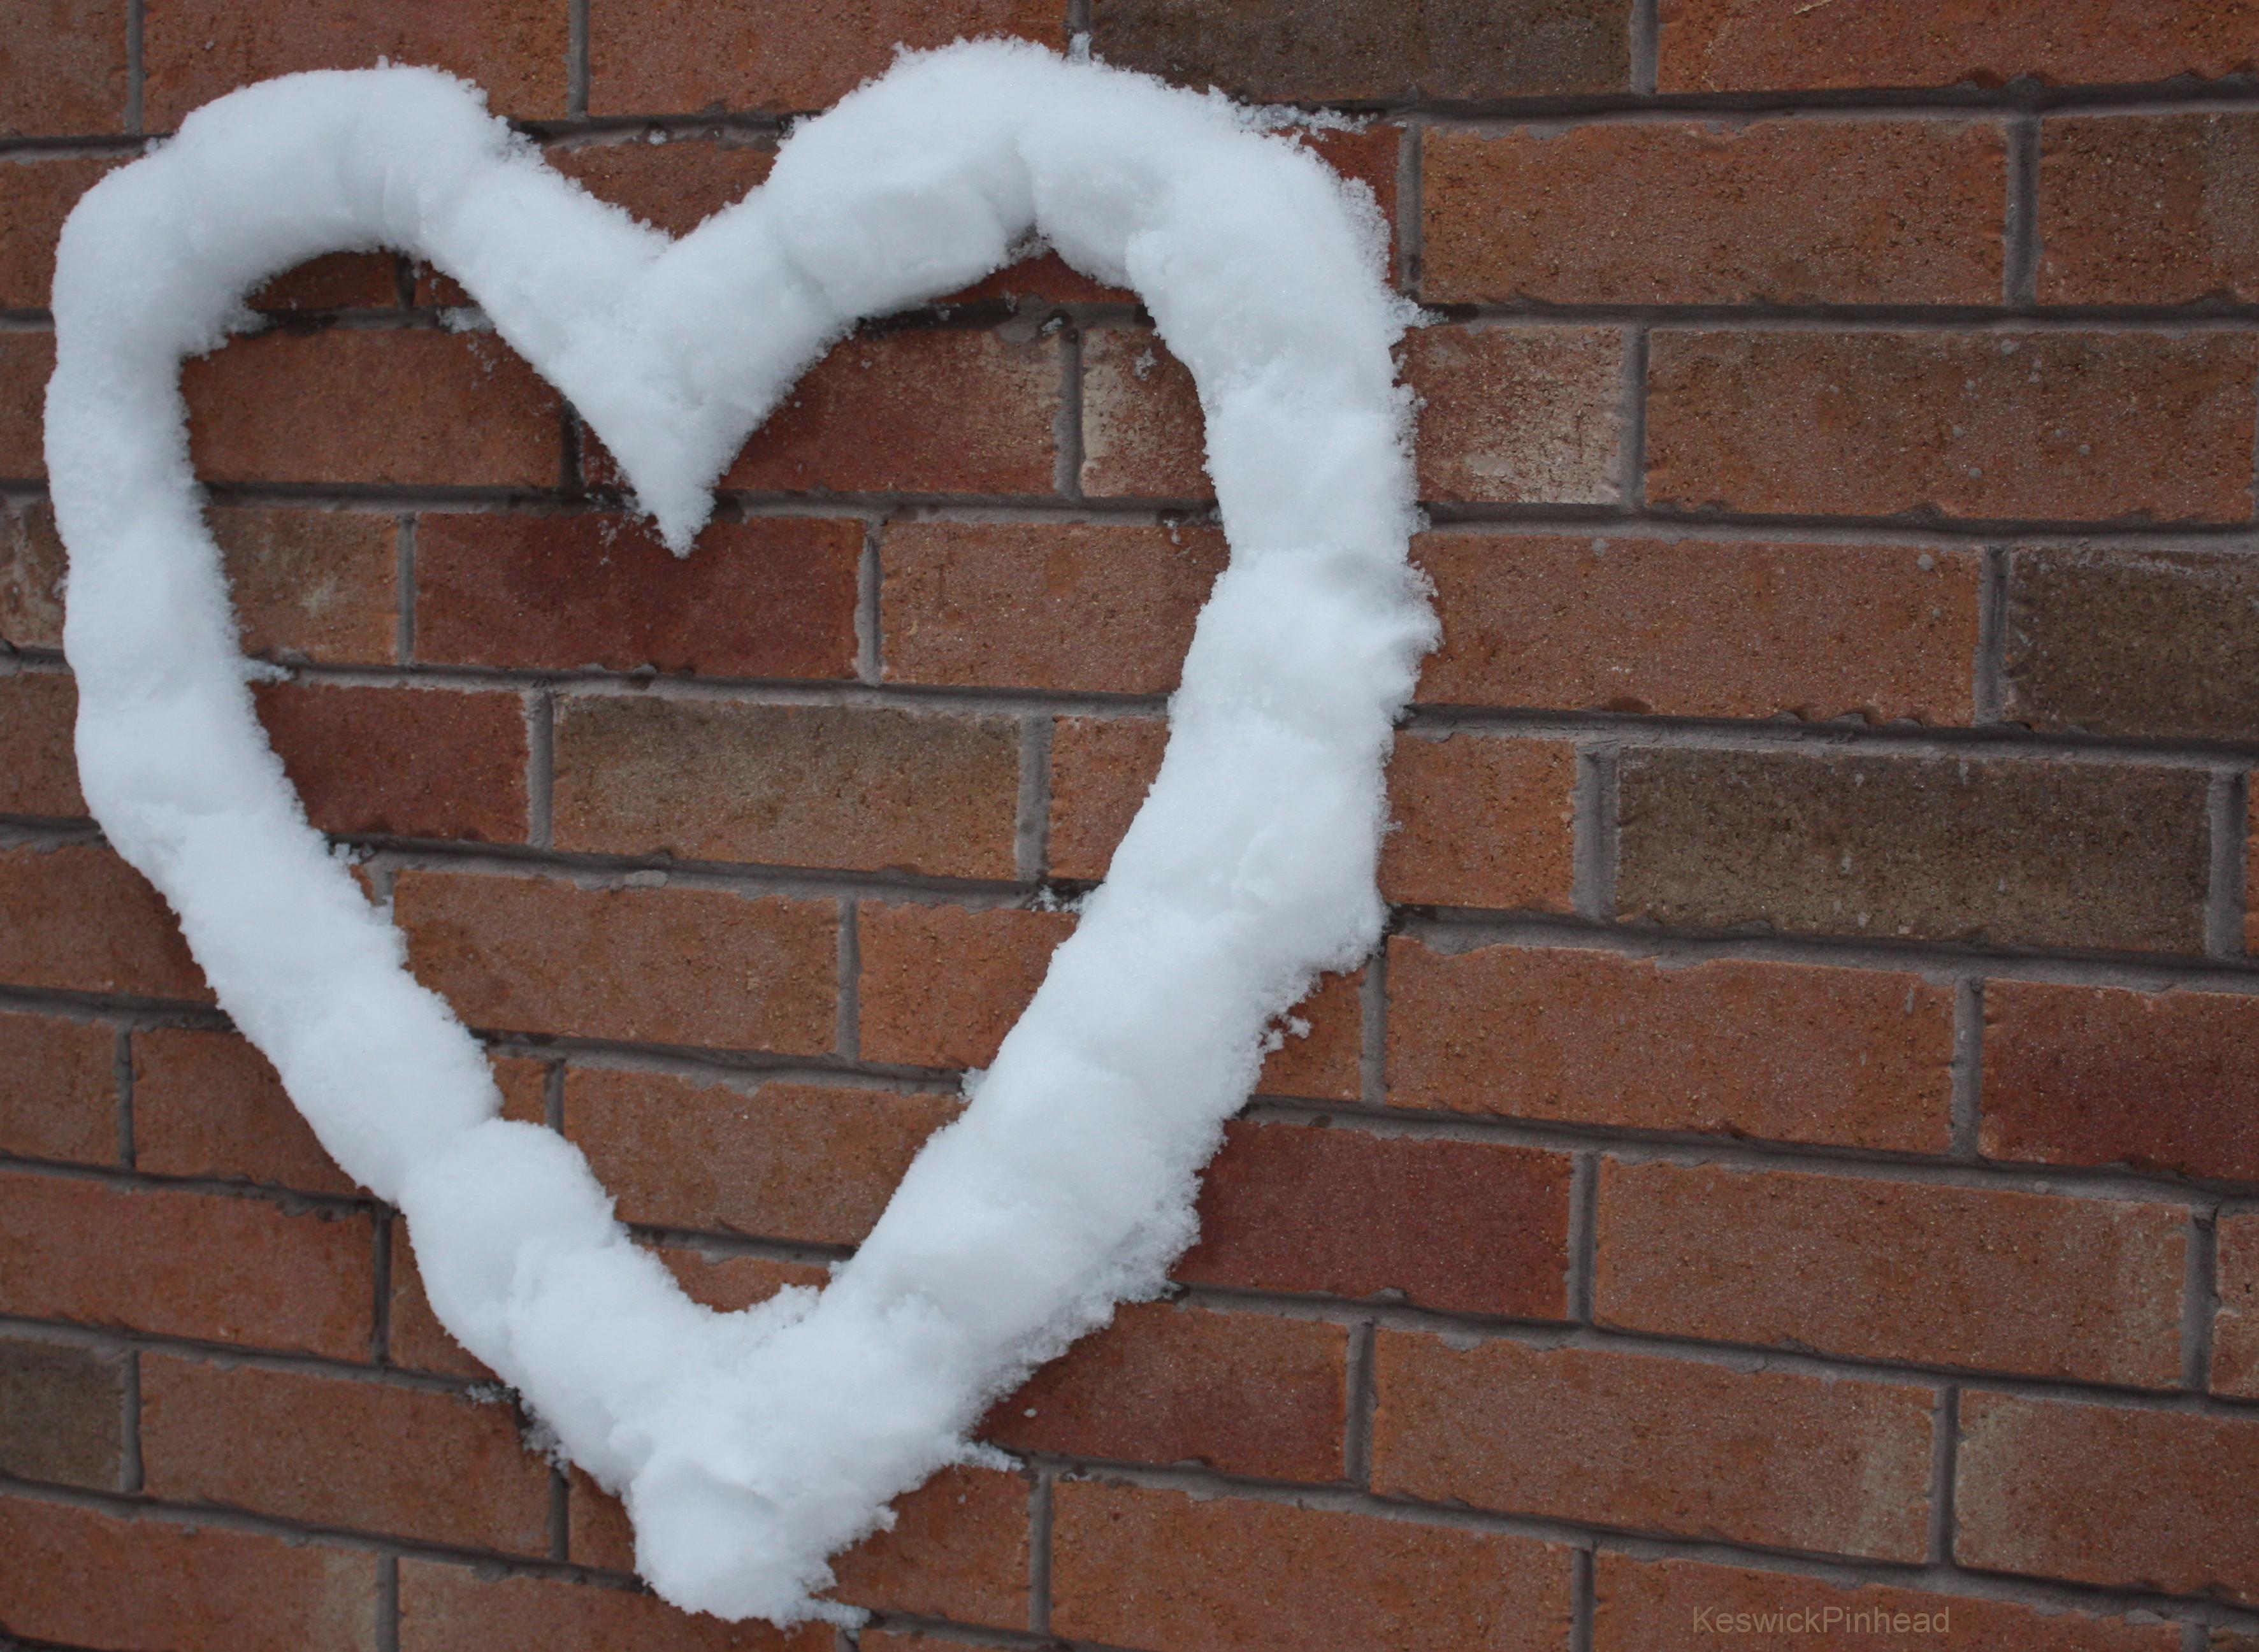 Mister Valentine, TEAR DOWN THIS WALL by KeswickPinhead